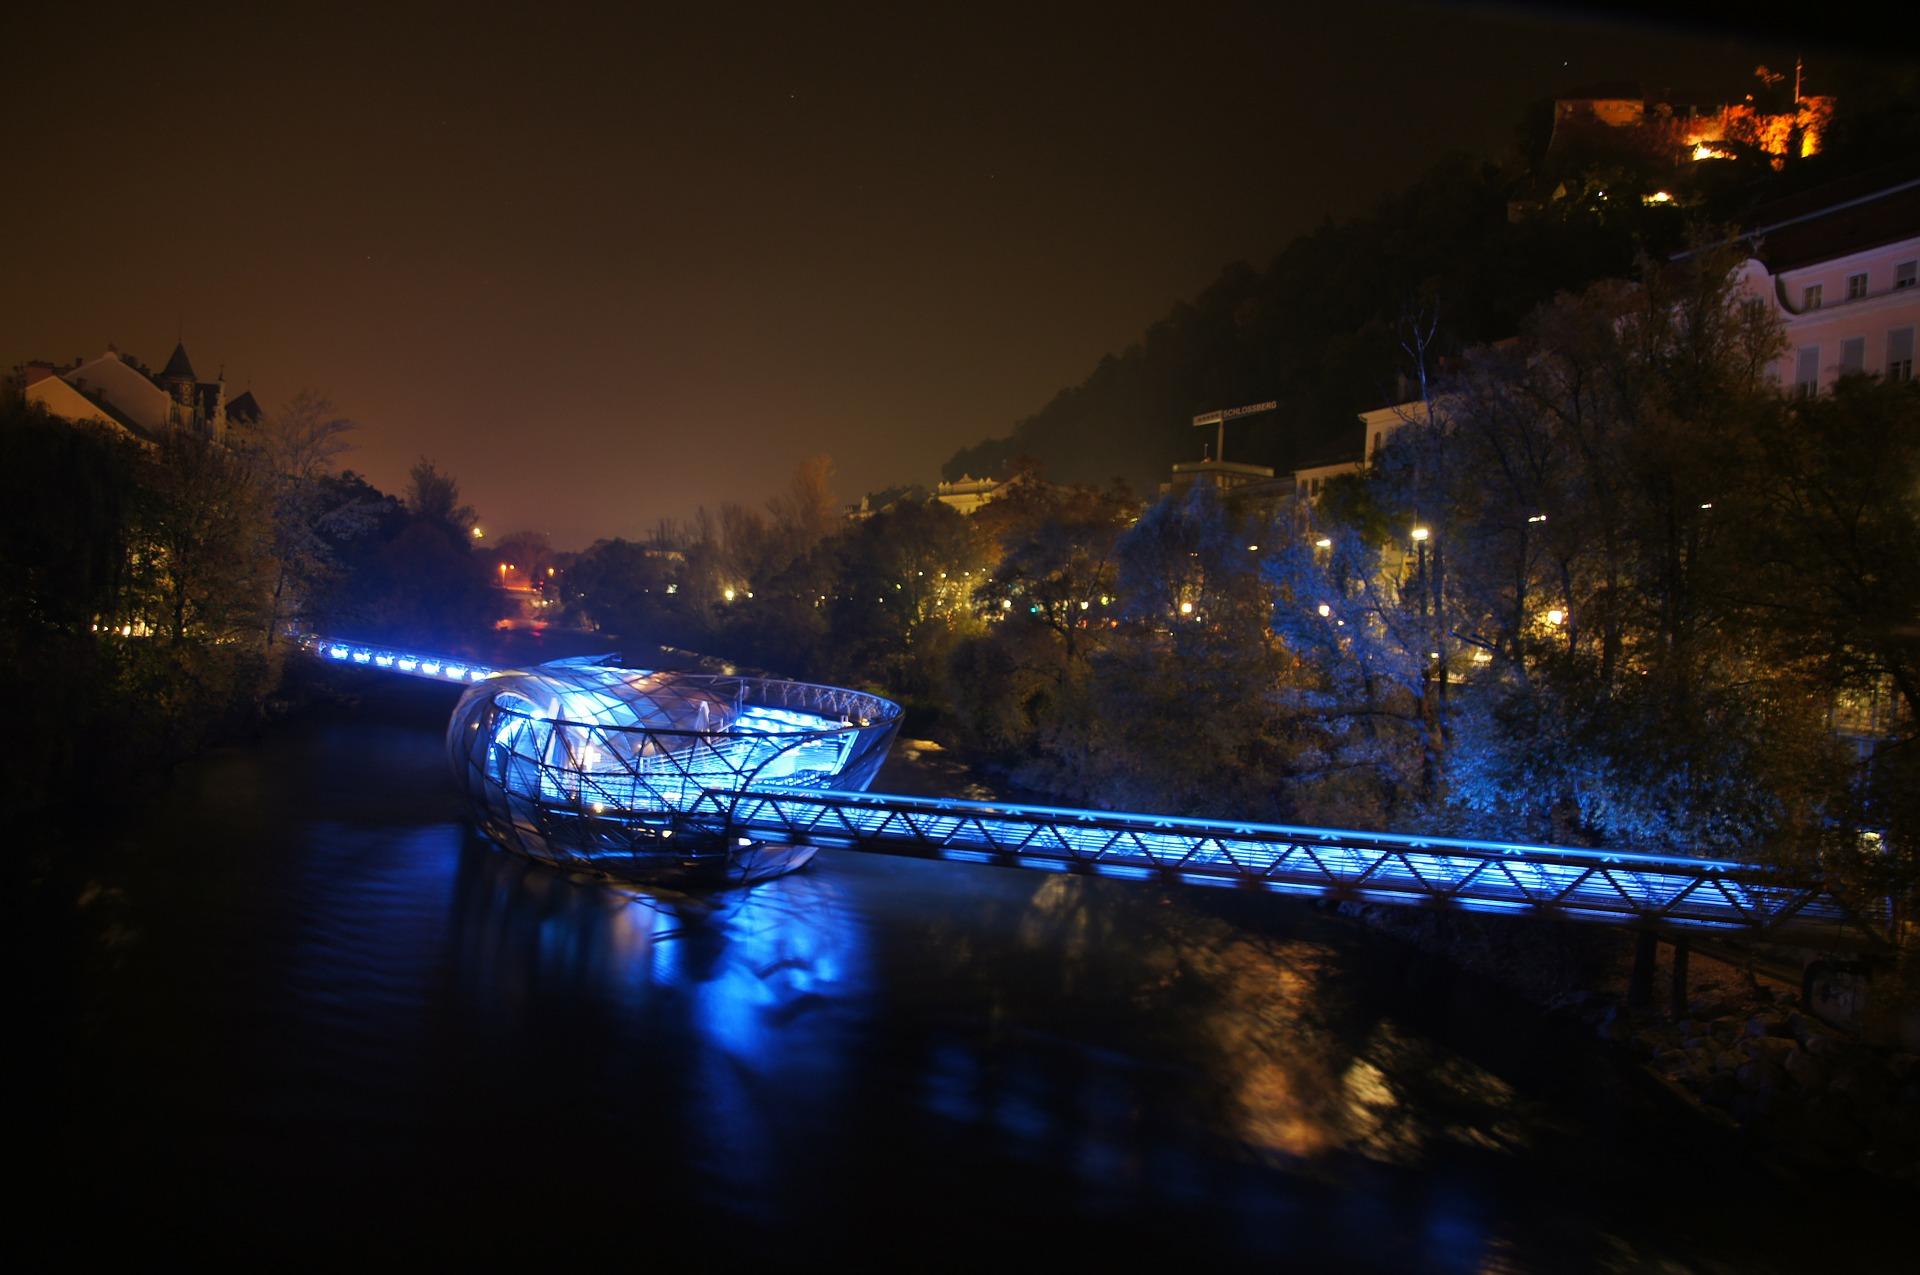 Mur River Bridge